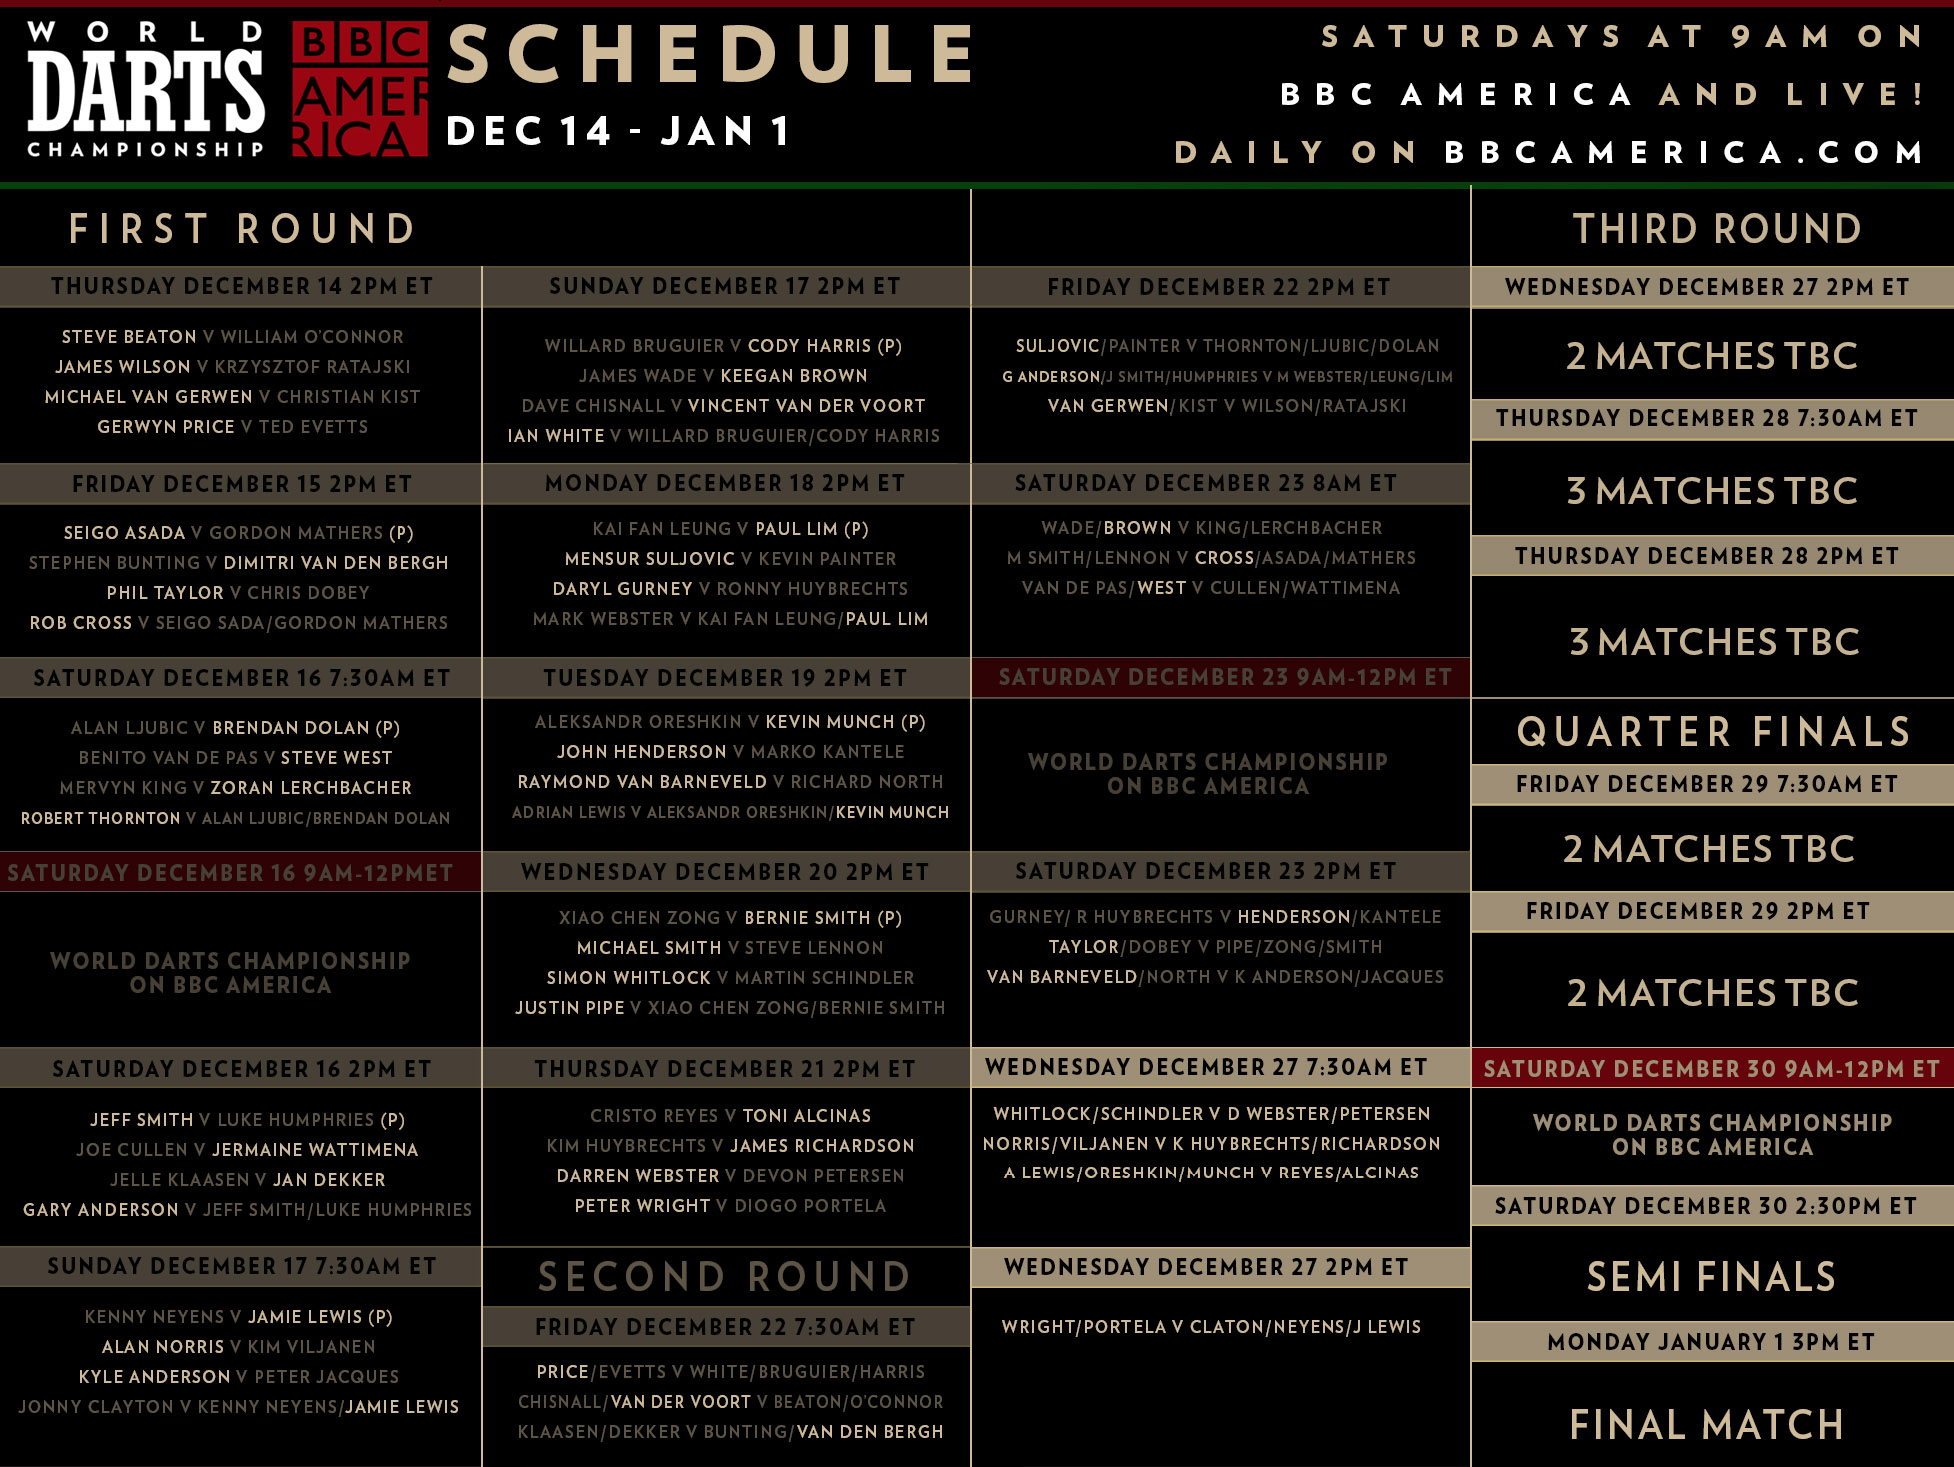 Darts schedule updated 12-26